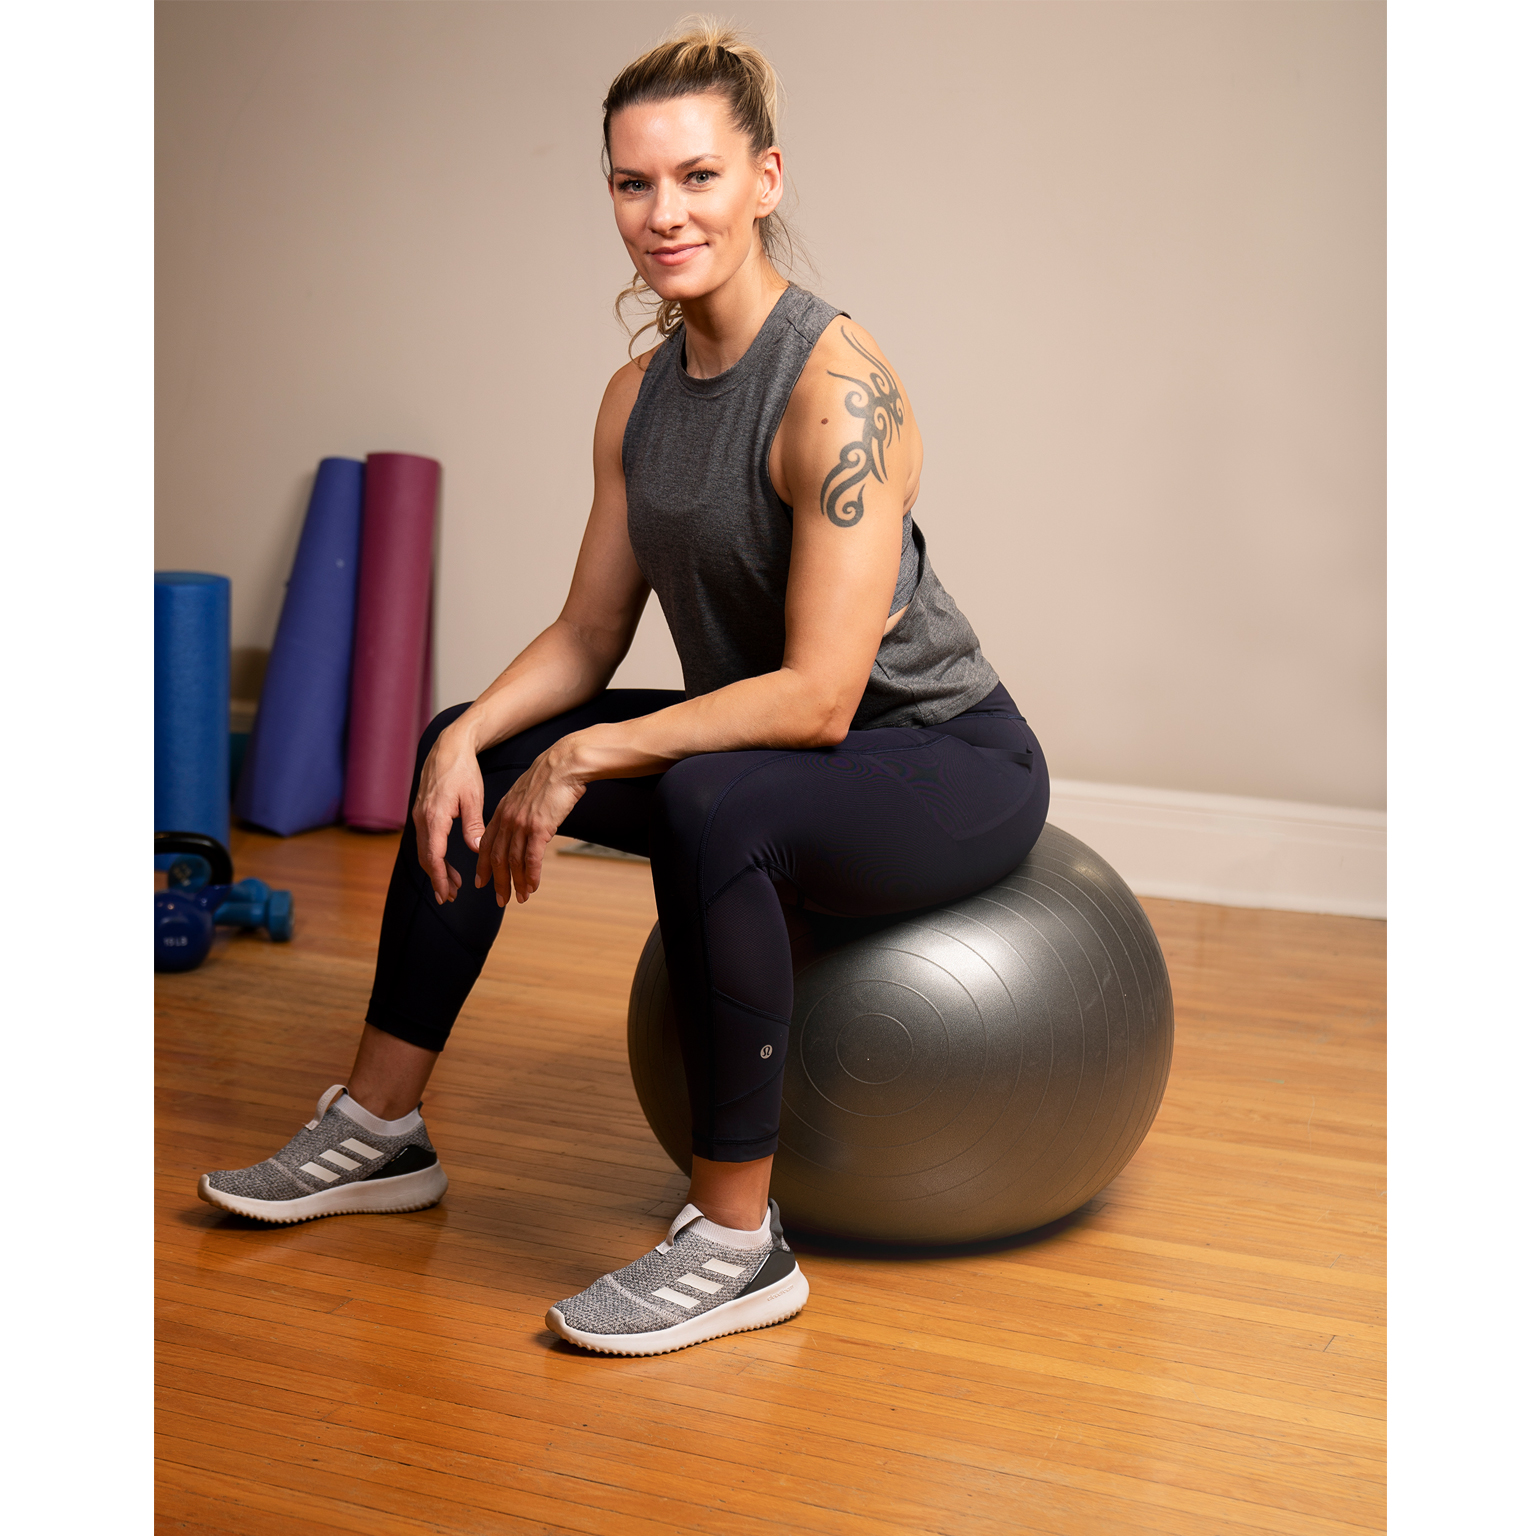 Toronto-Fitness-Model-Agency-Lifestyle-Commercial-Model-Adrienne-Davis